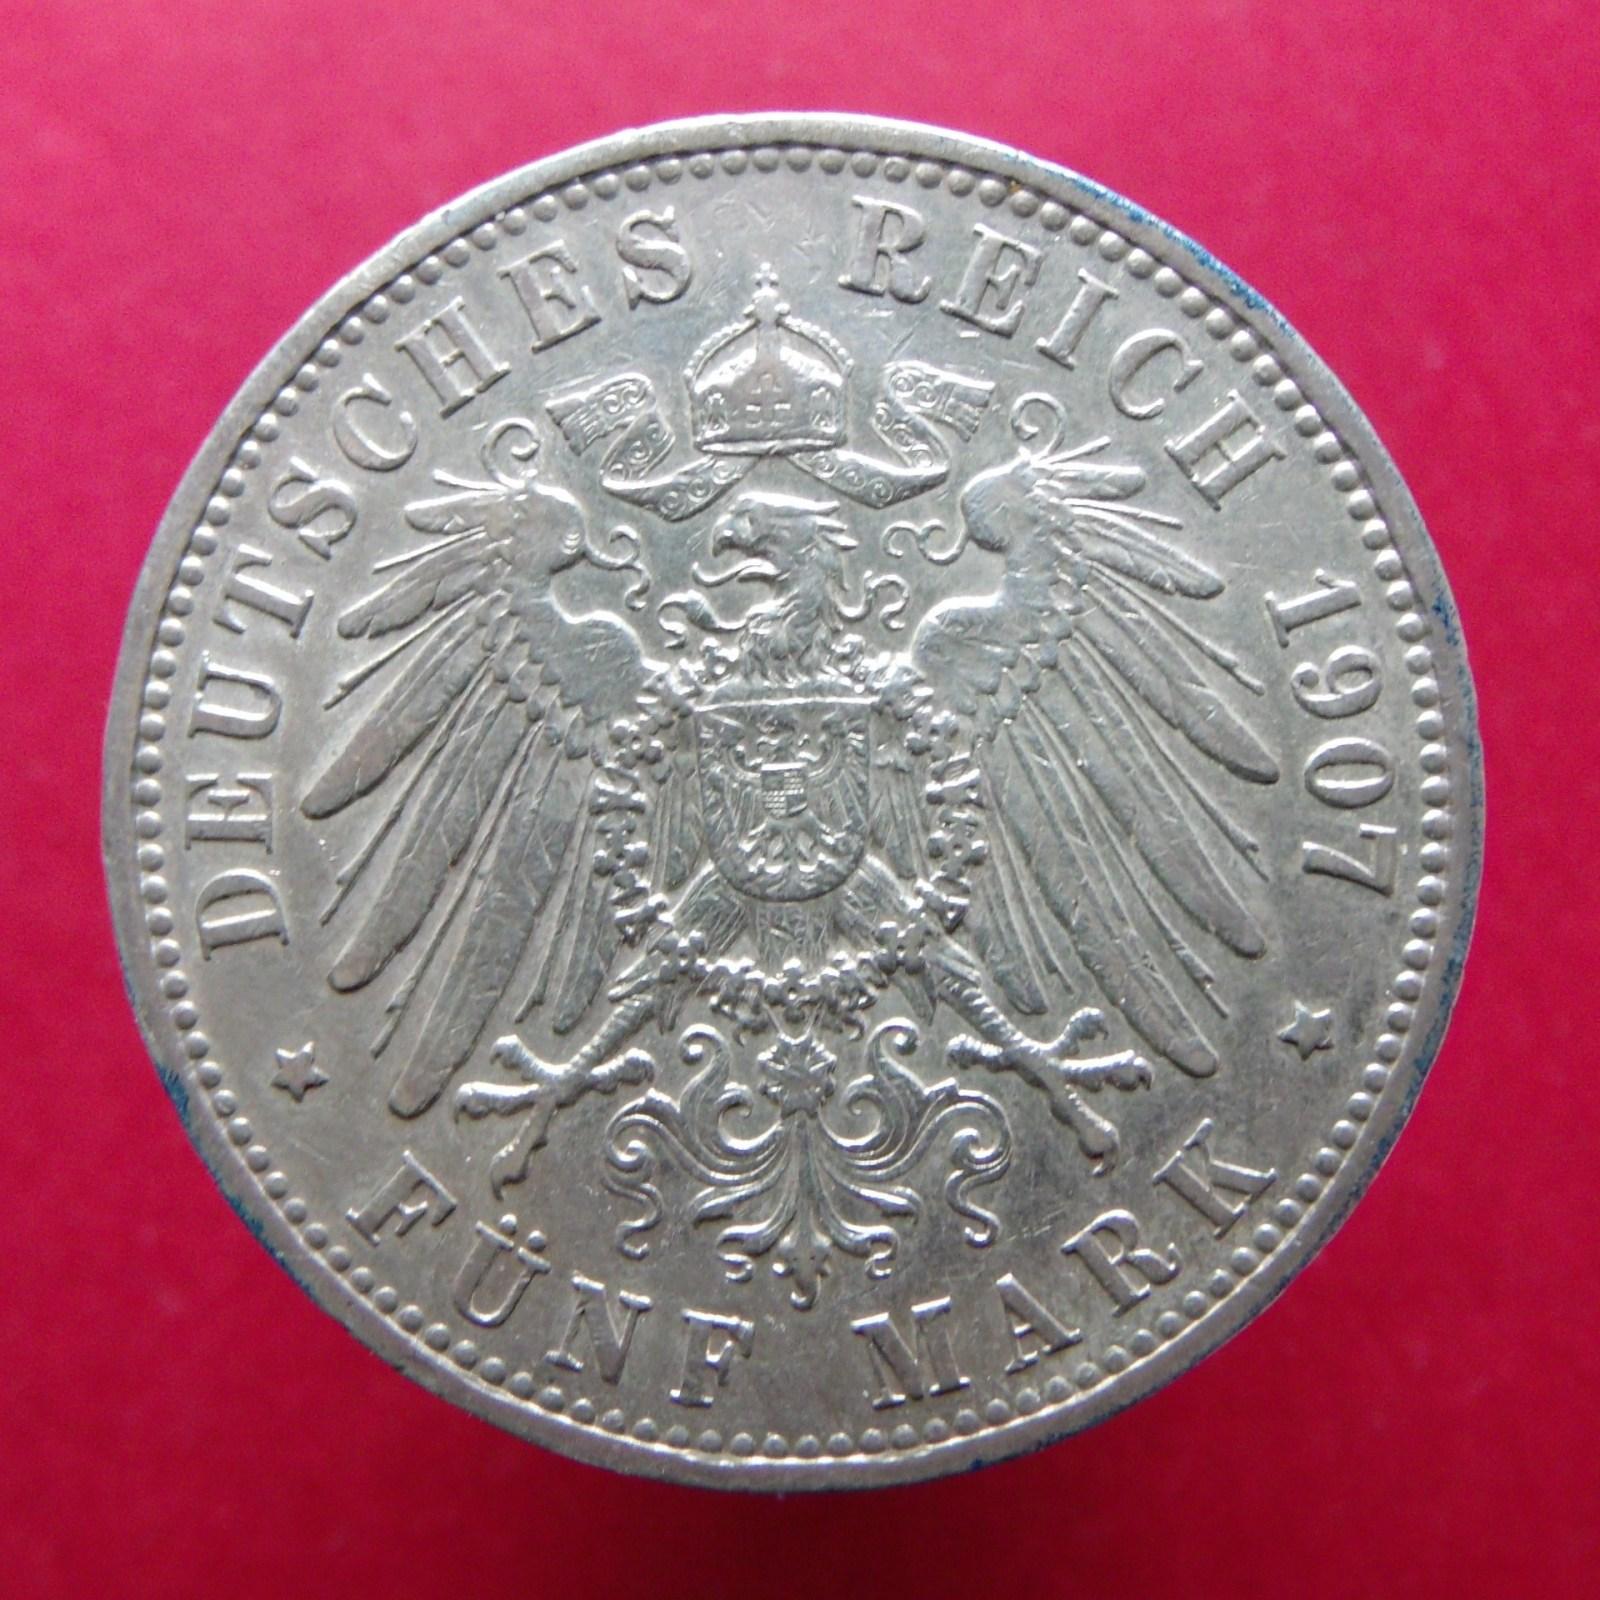 Alemania. Monedas del Reino de Prusia (1701-1918) - Página 2 11udim9